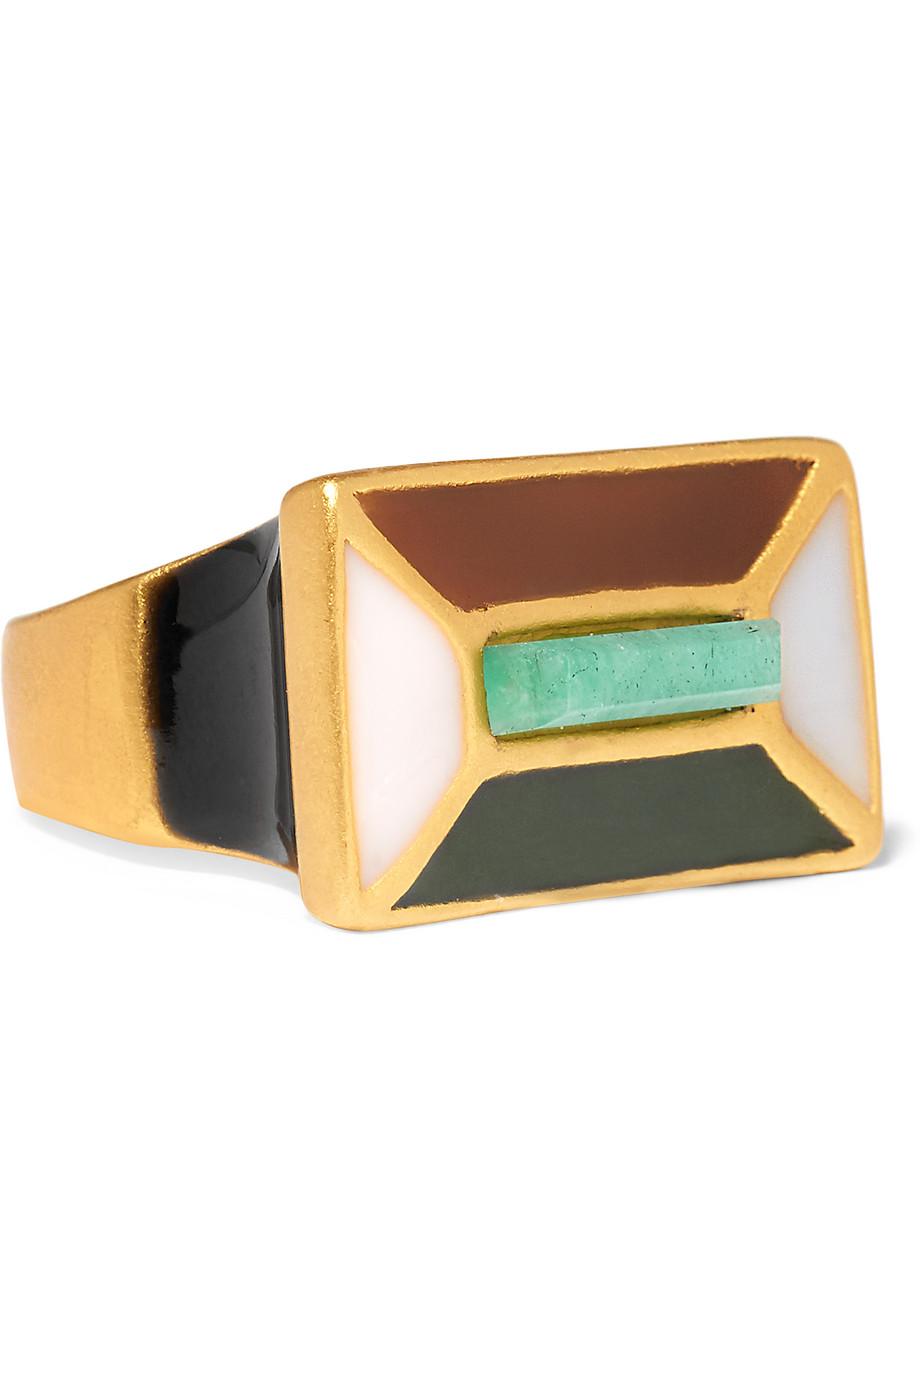 Paula Mendoza Hexagon Gold-Plated, Enamel and Emerald Ring, Gold/Emerald, Women's, Size: 6